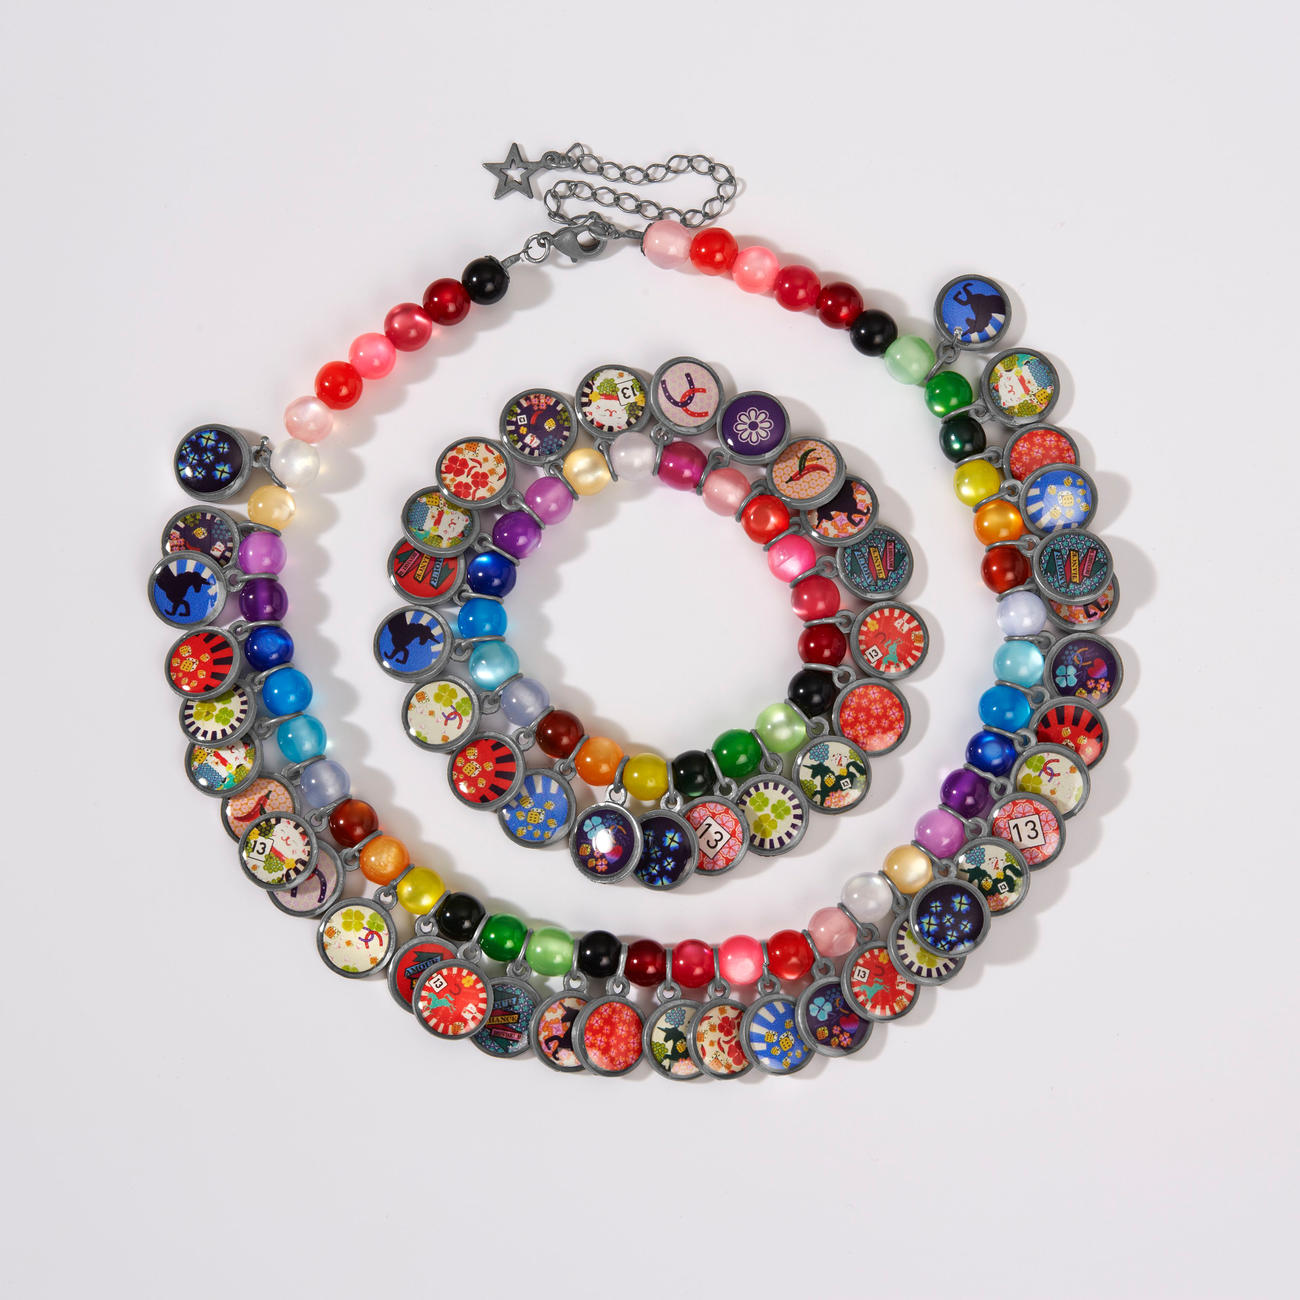 Litchi ethno gl cksarmband 3 jahre garantie pro idee for Porte bracelet pas cher